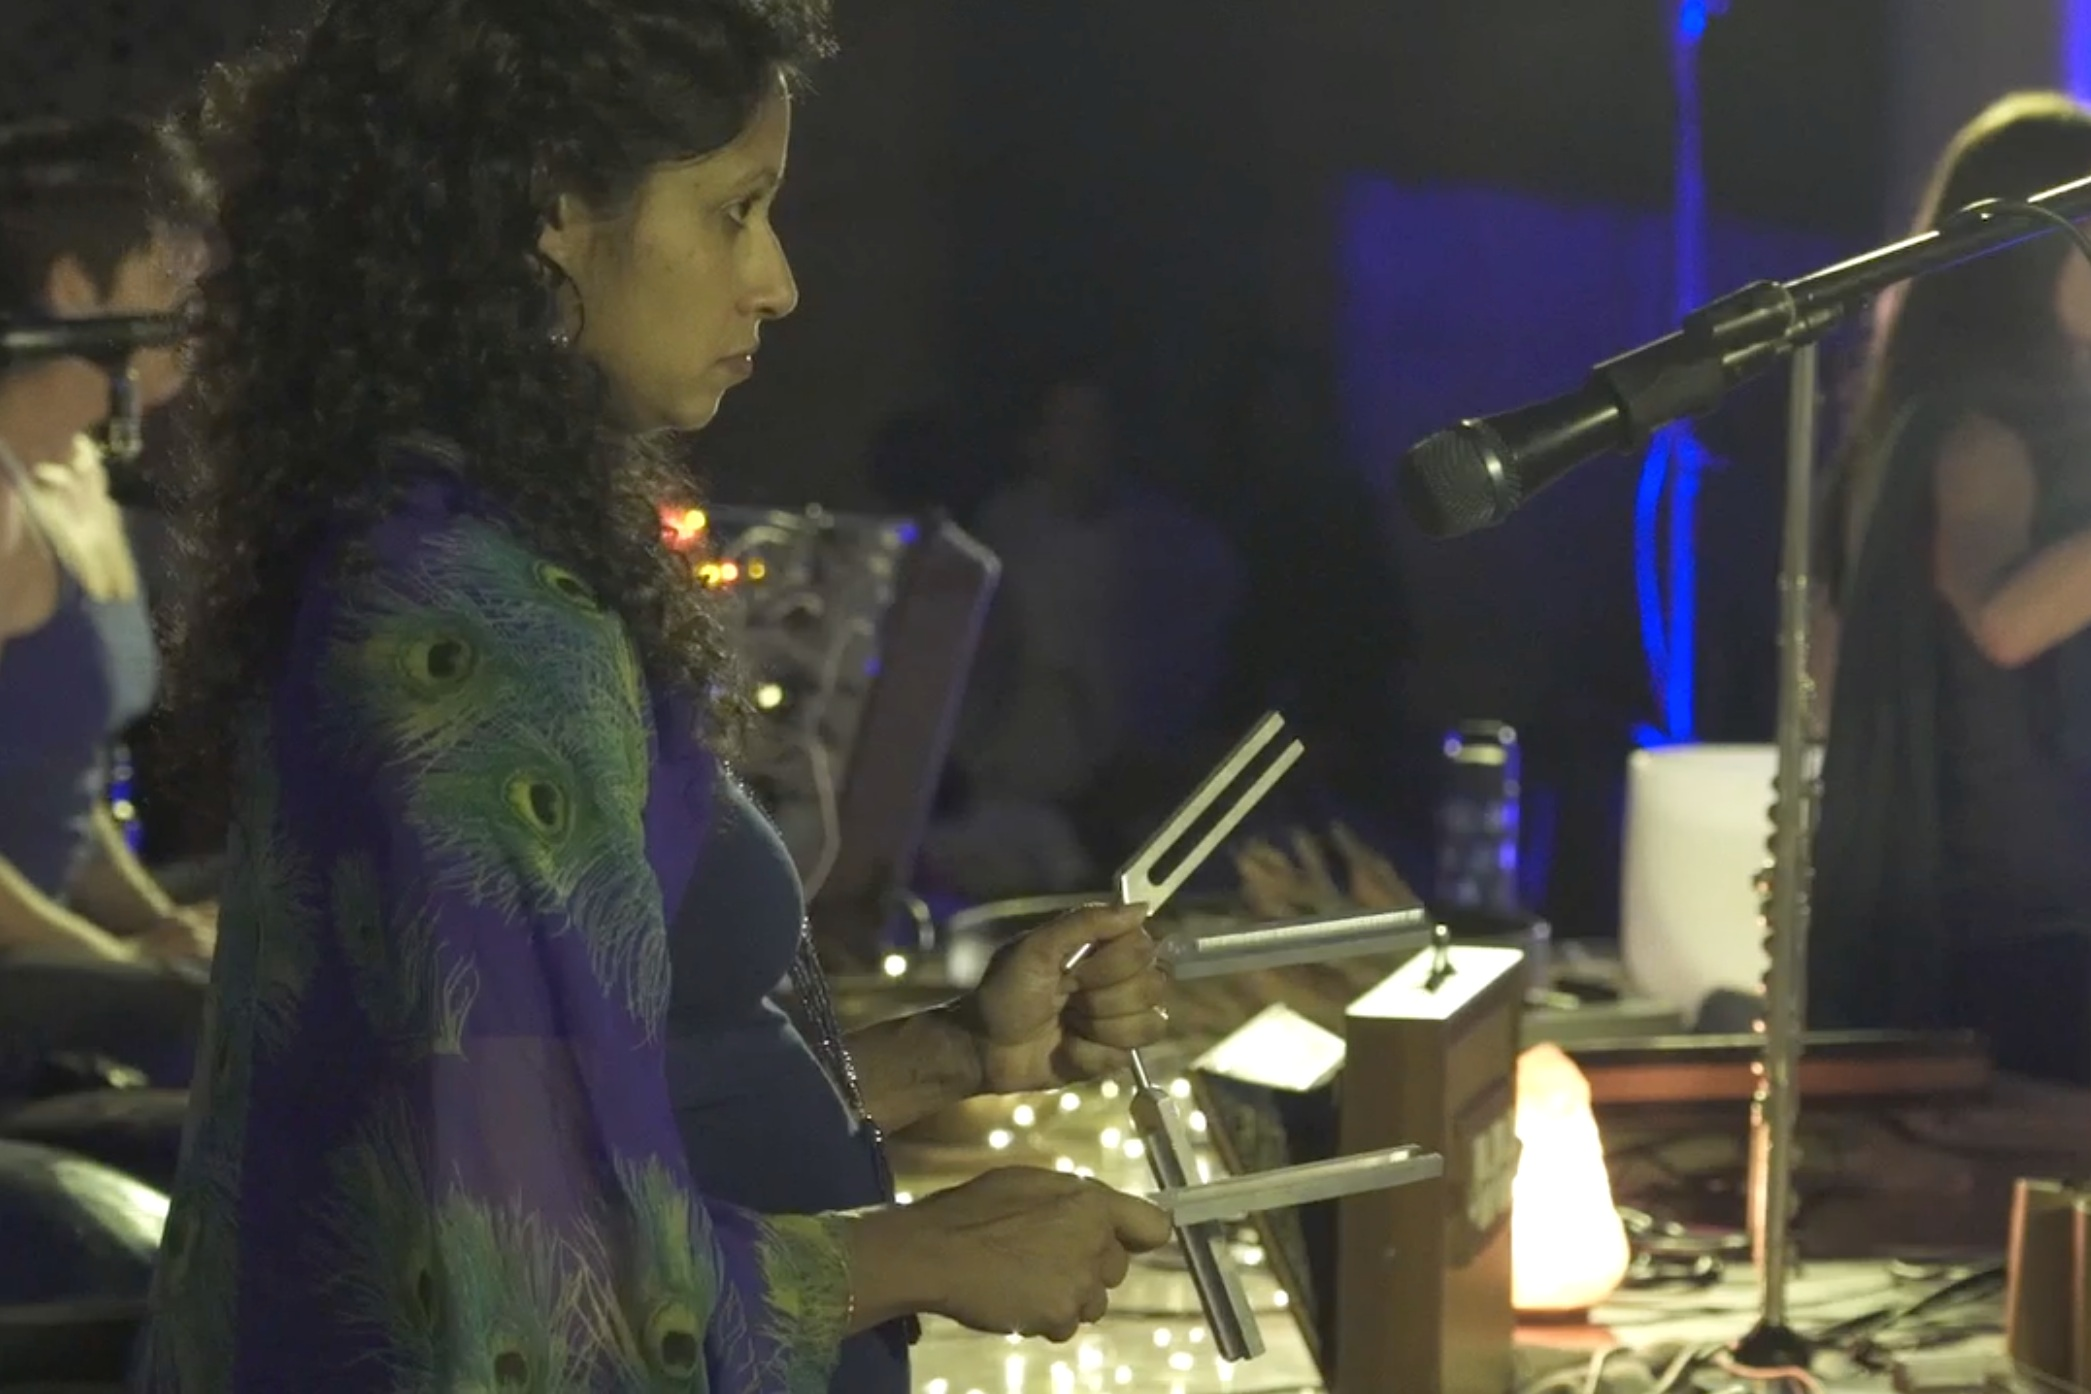 Priya Deepika Mohan - Practitioner, Coach and Consultant in Proactive Mediation, Voice musician and Sound Healerpriyadeepika.net